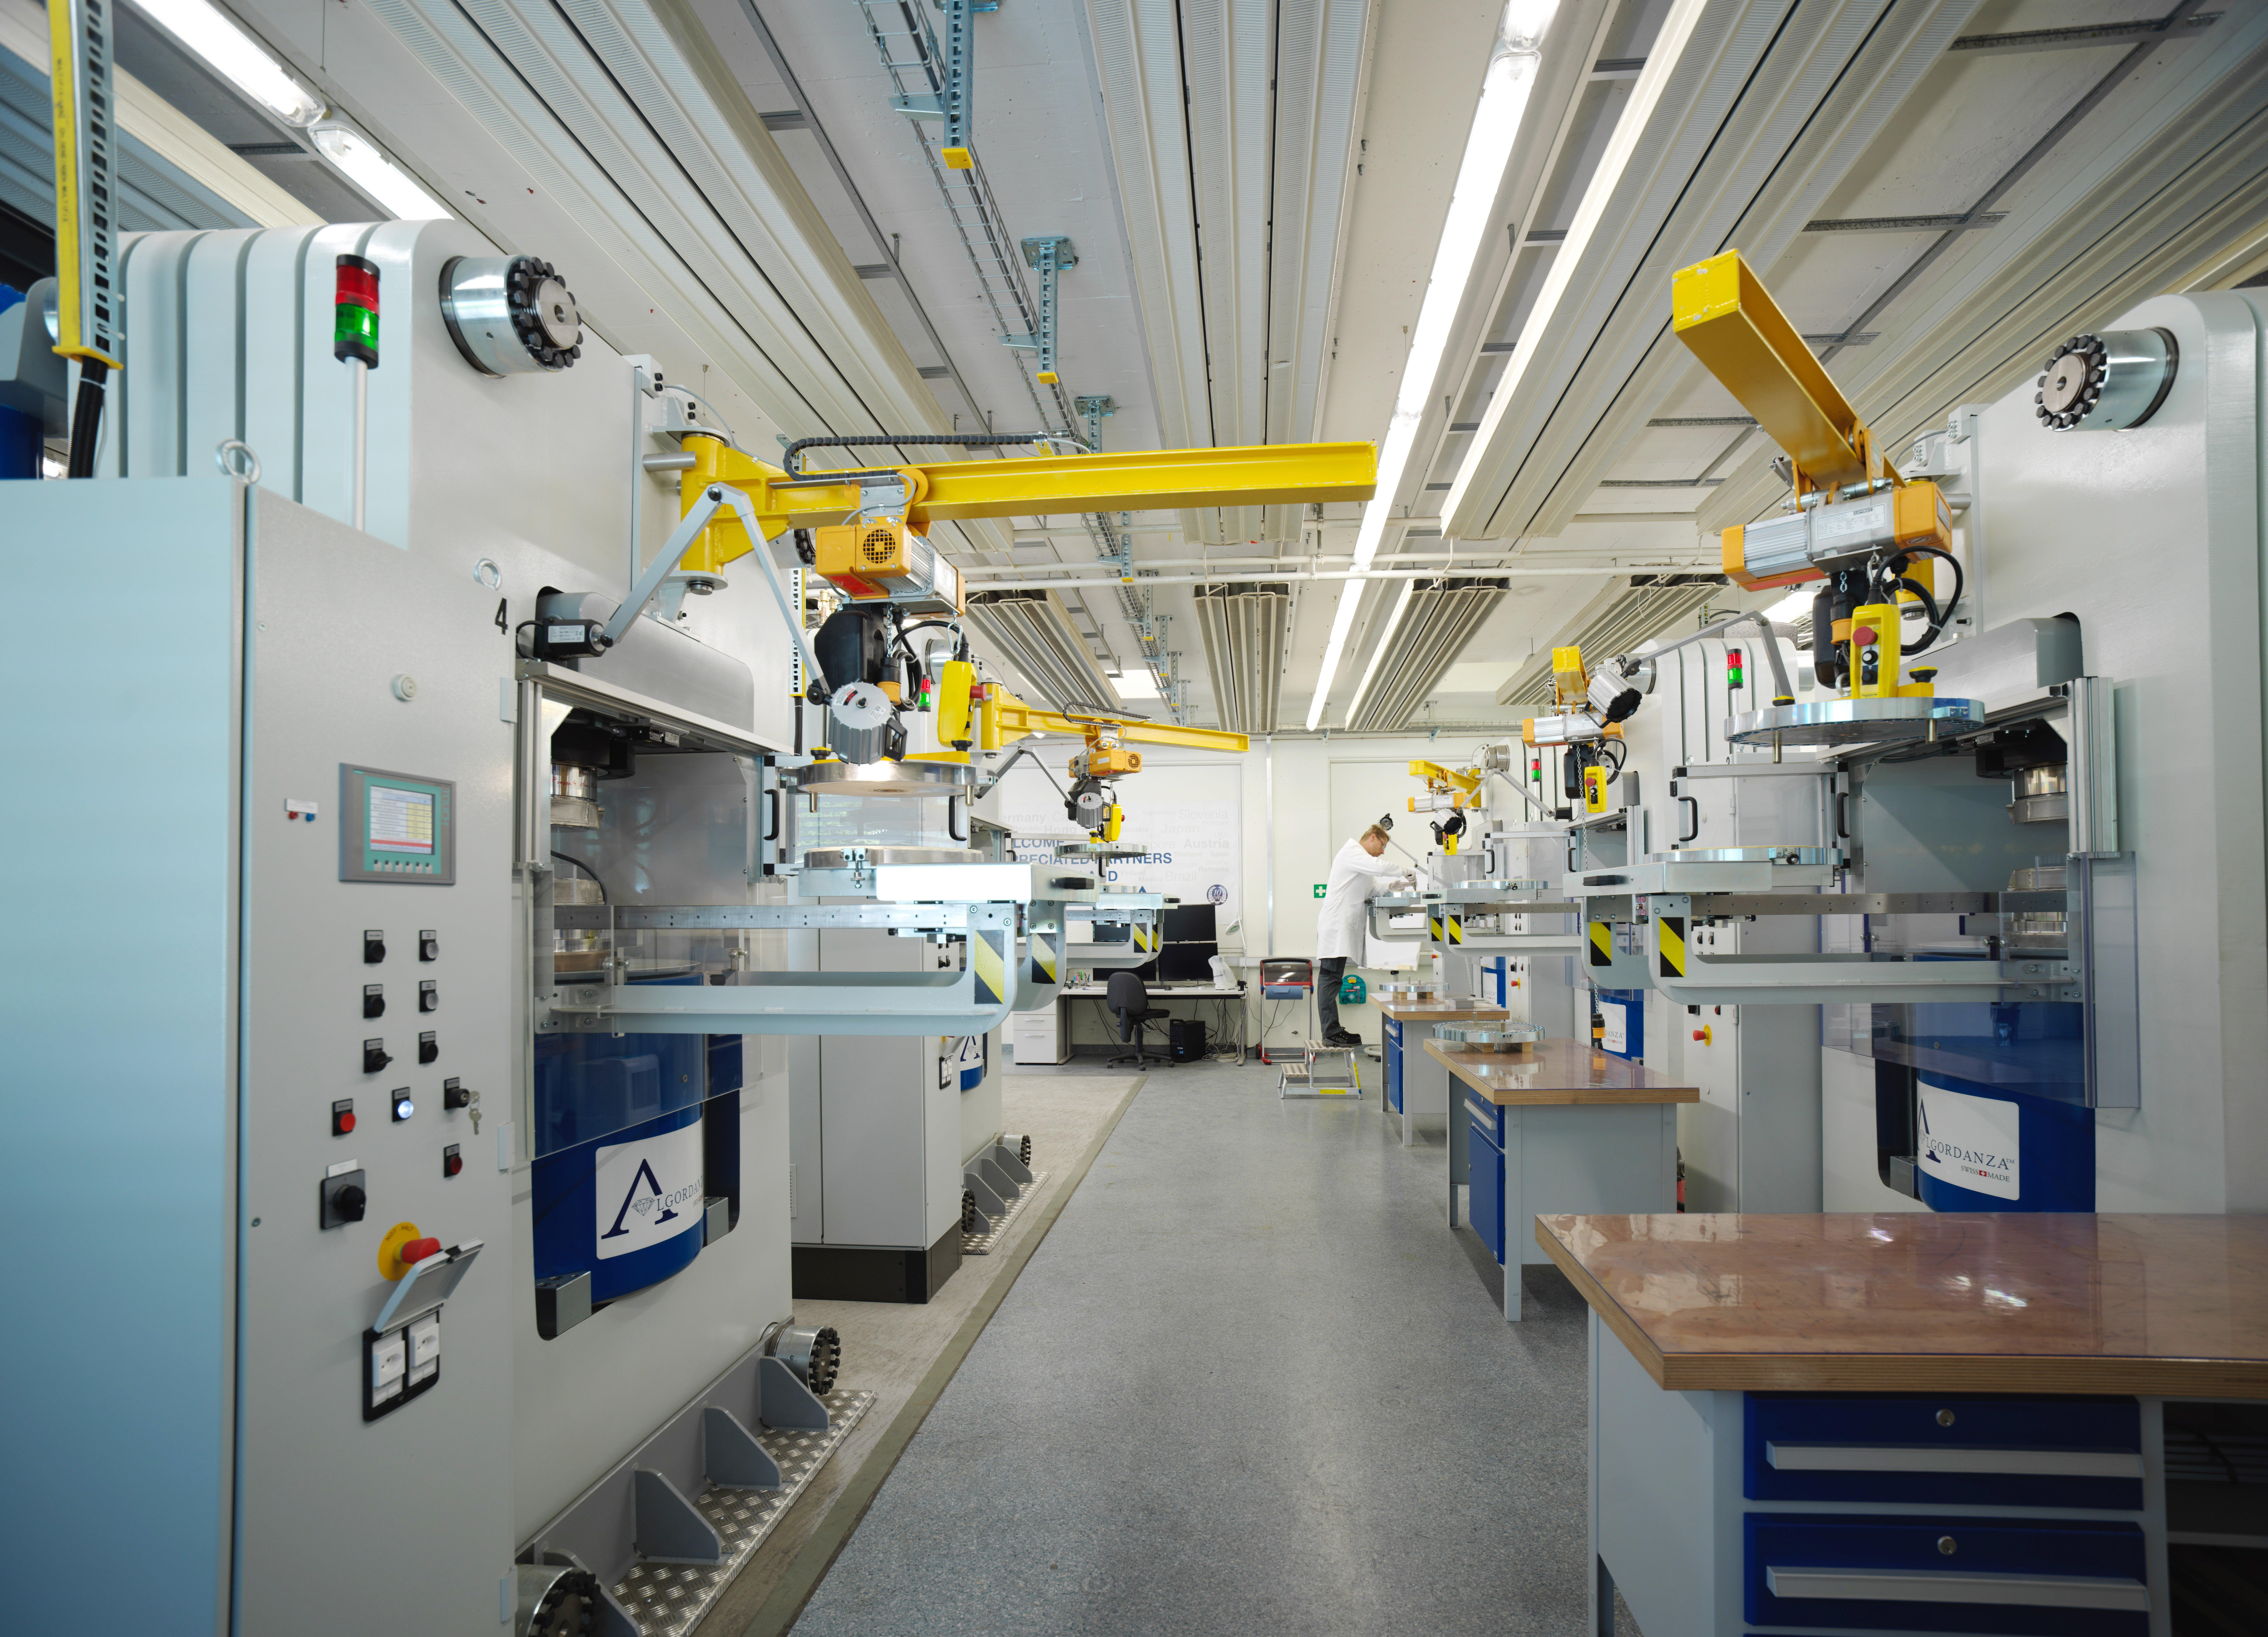 Algordanza骨灰鑽石實驗室機器設備